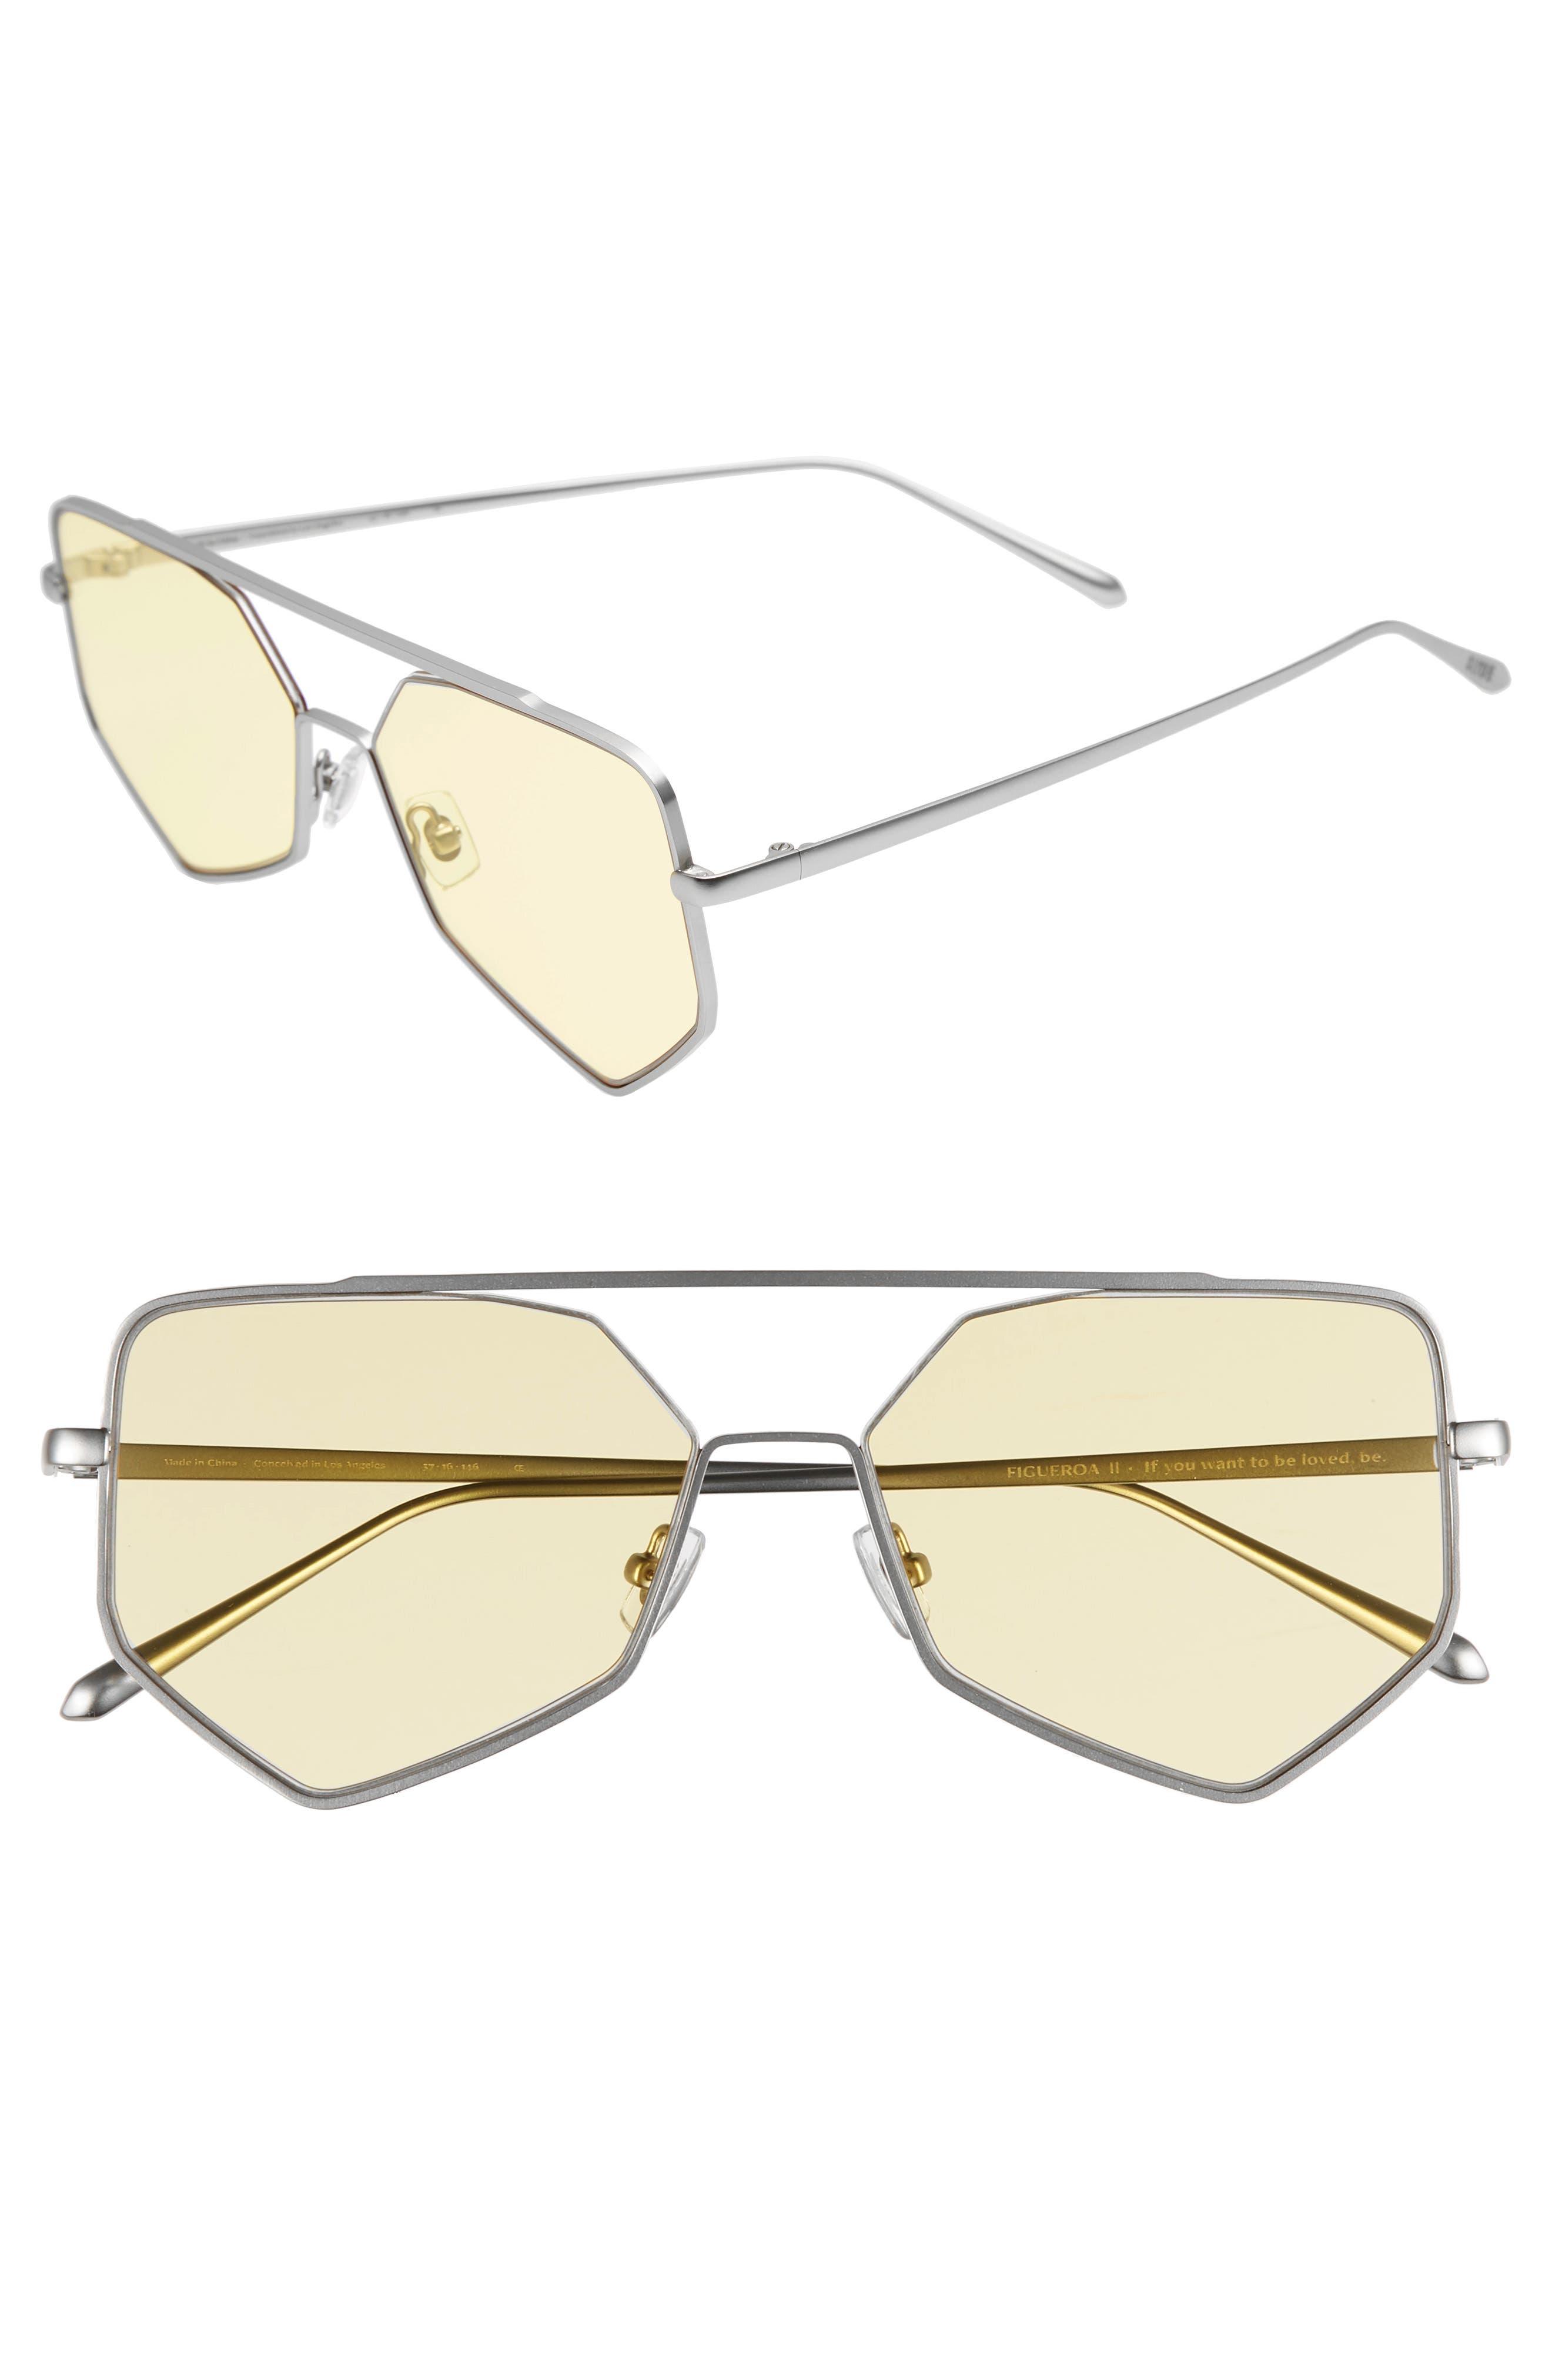 Bonnie Clyde Figueroa Ii 57Mm Aviator Sunglasses - Yellow